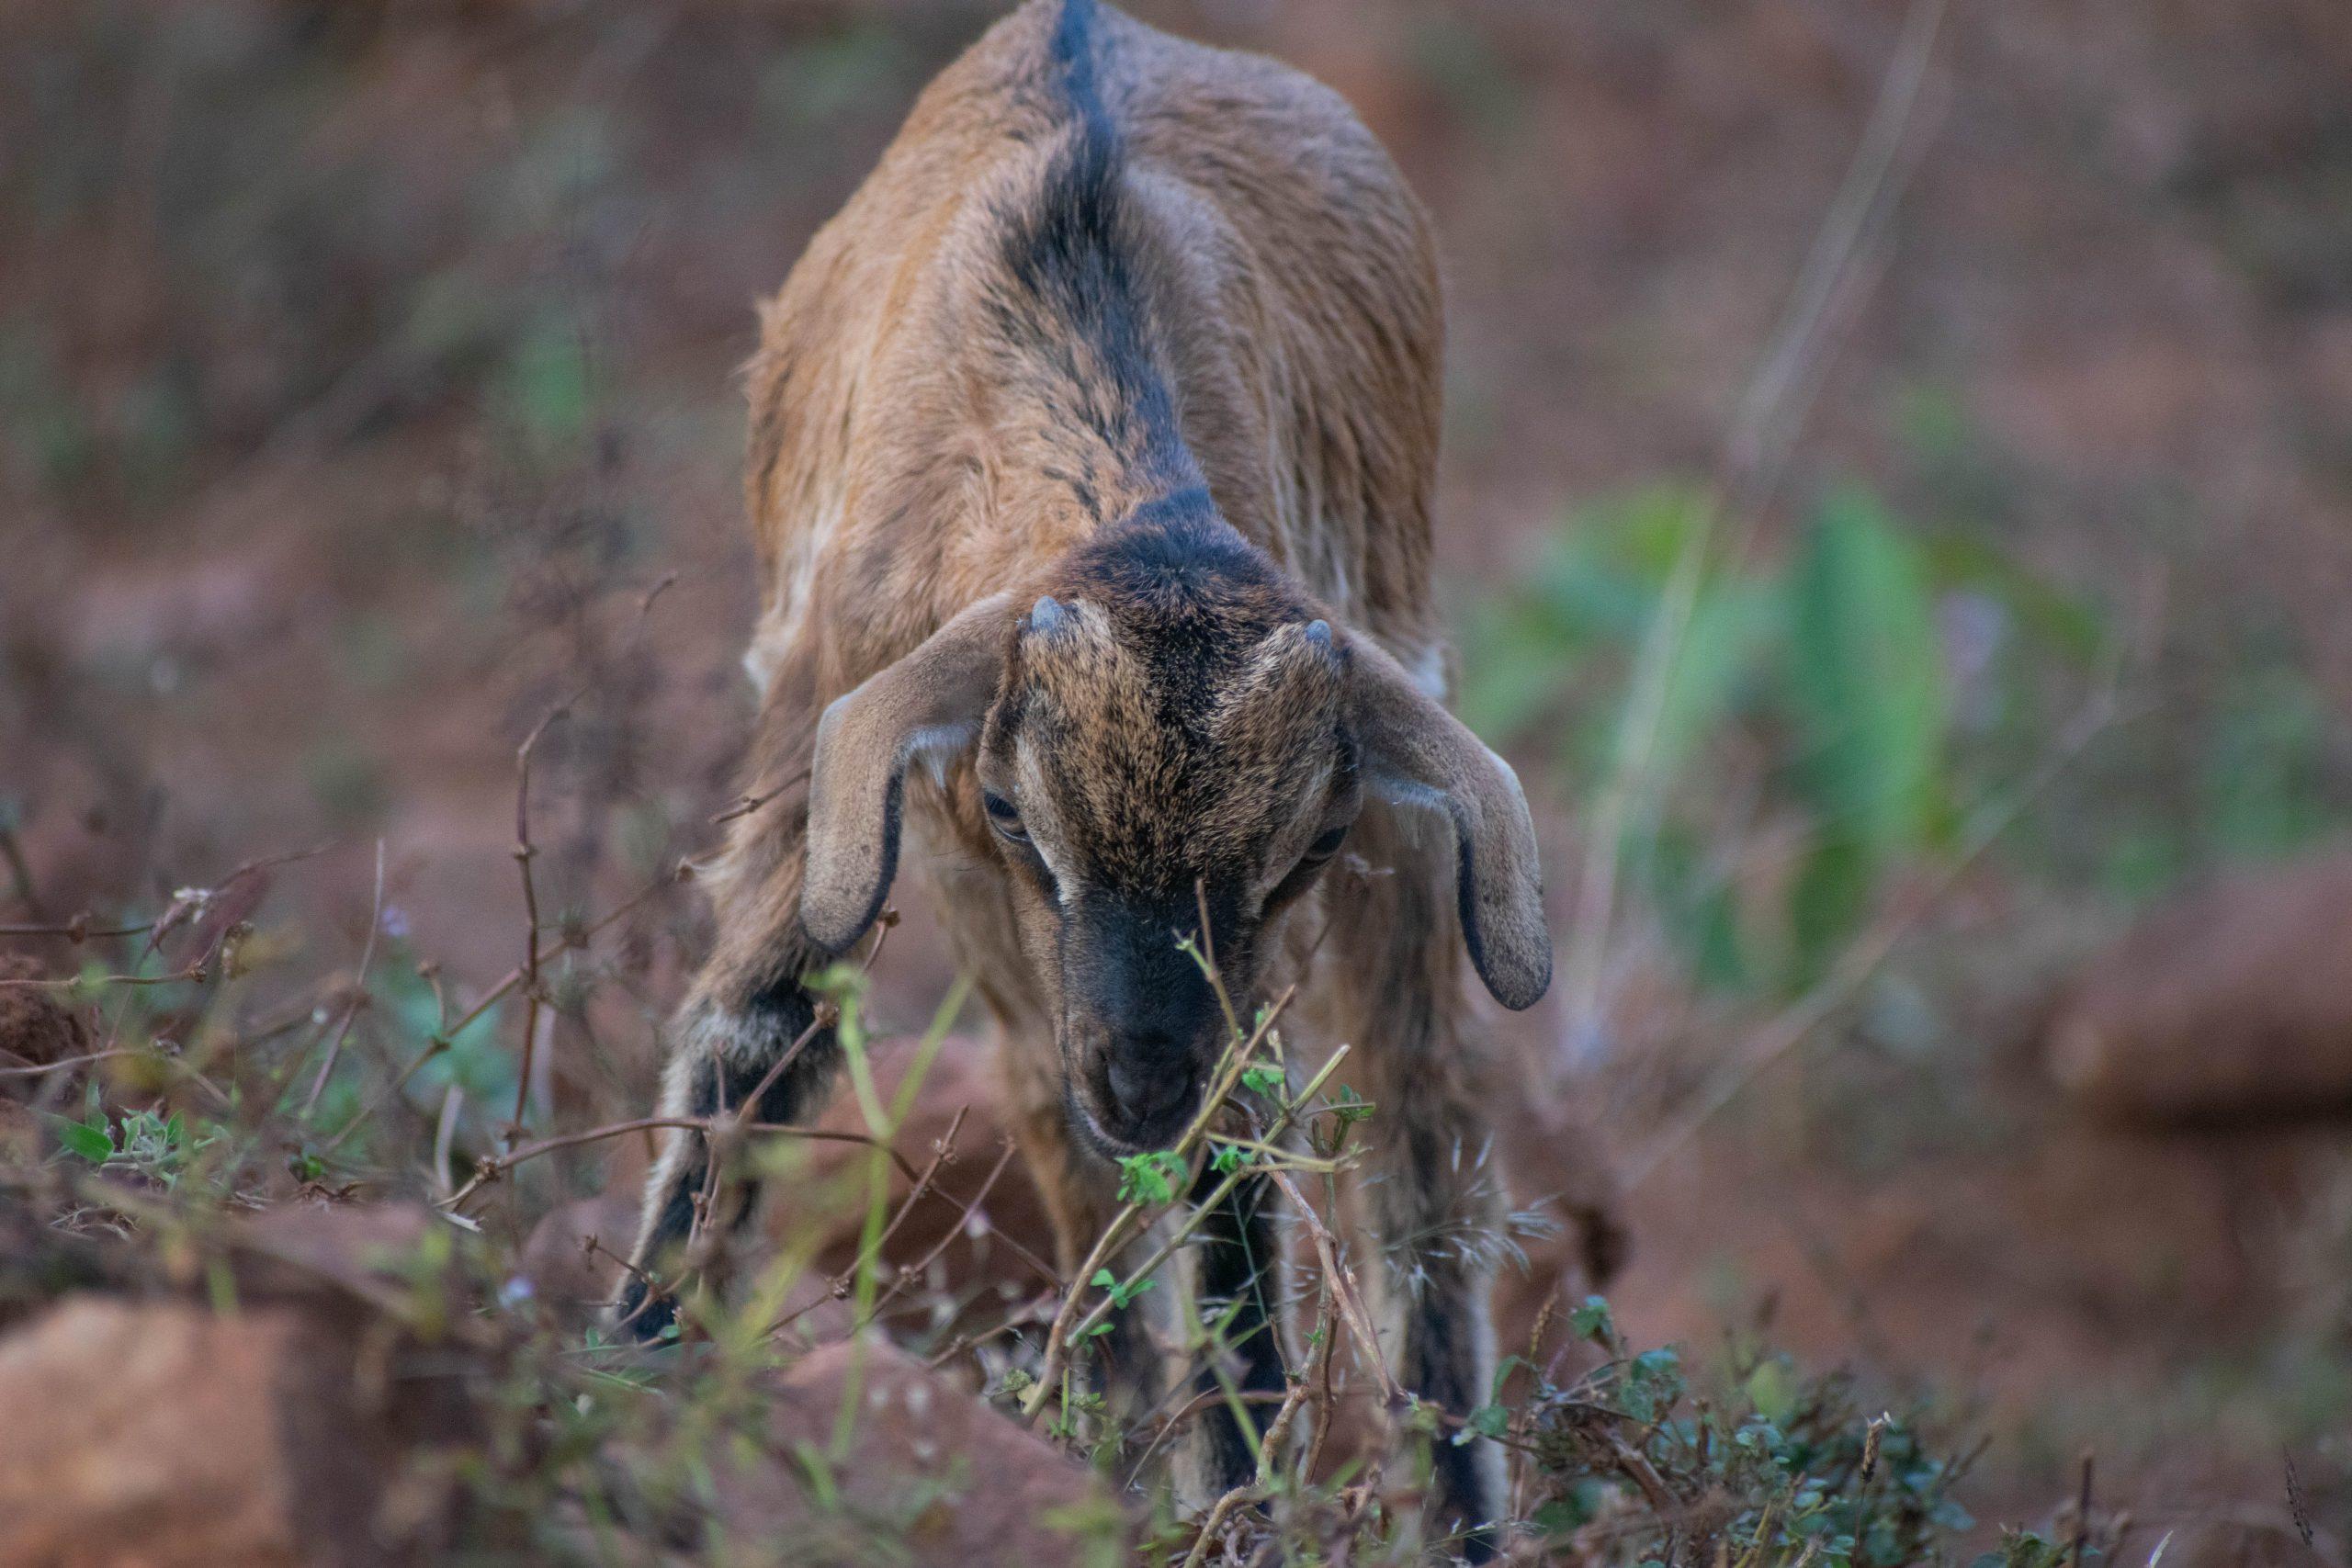 a goat in wild